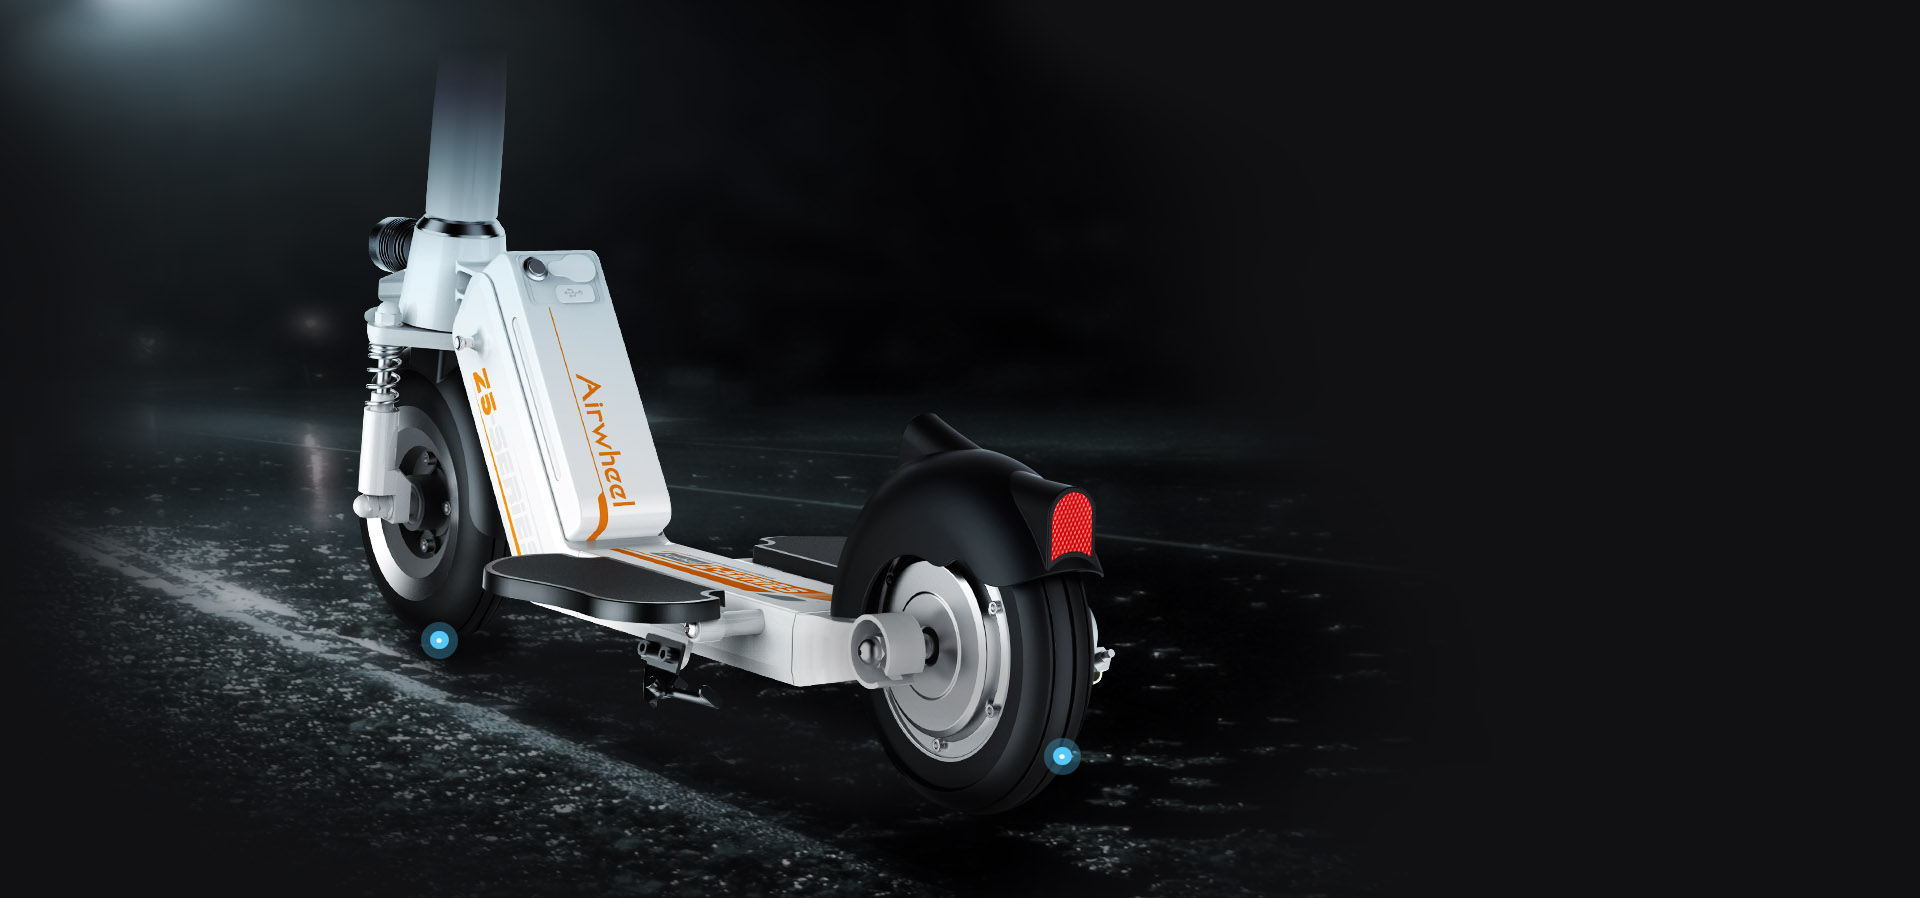 Z5 Airwheel